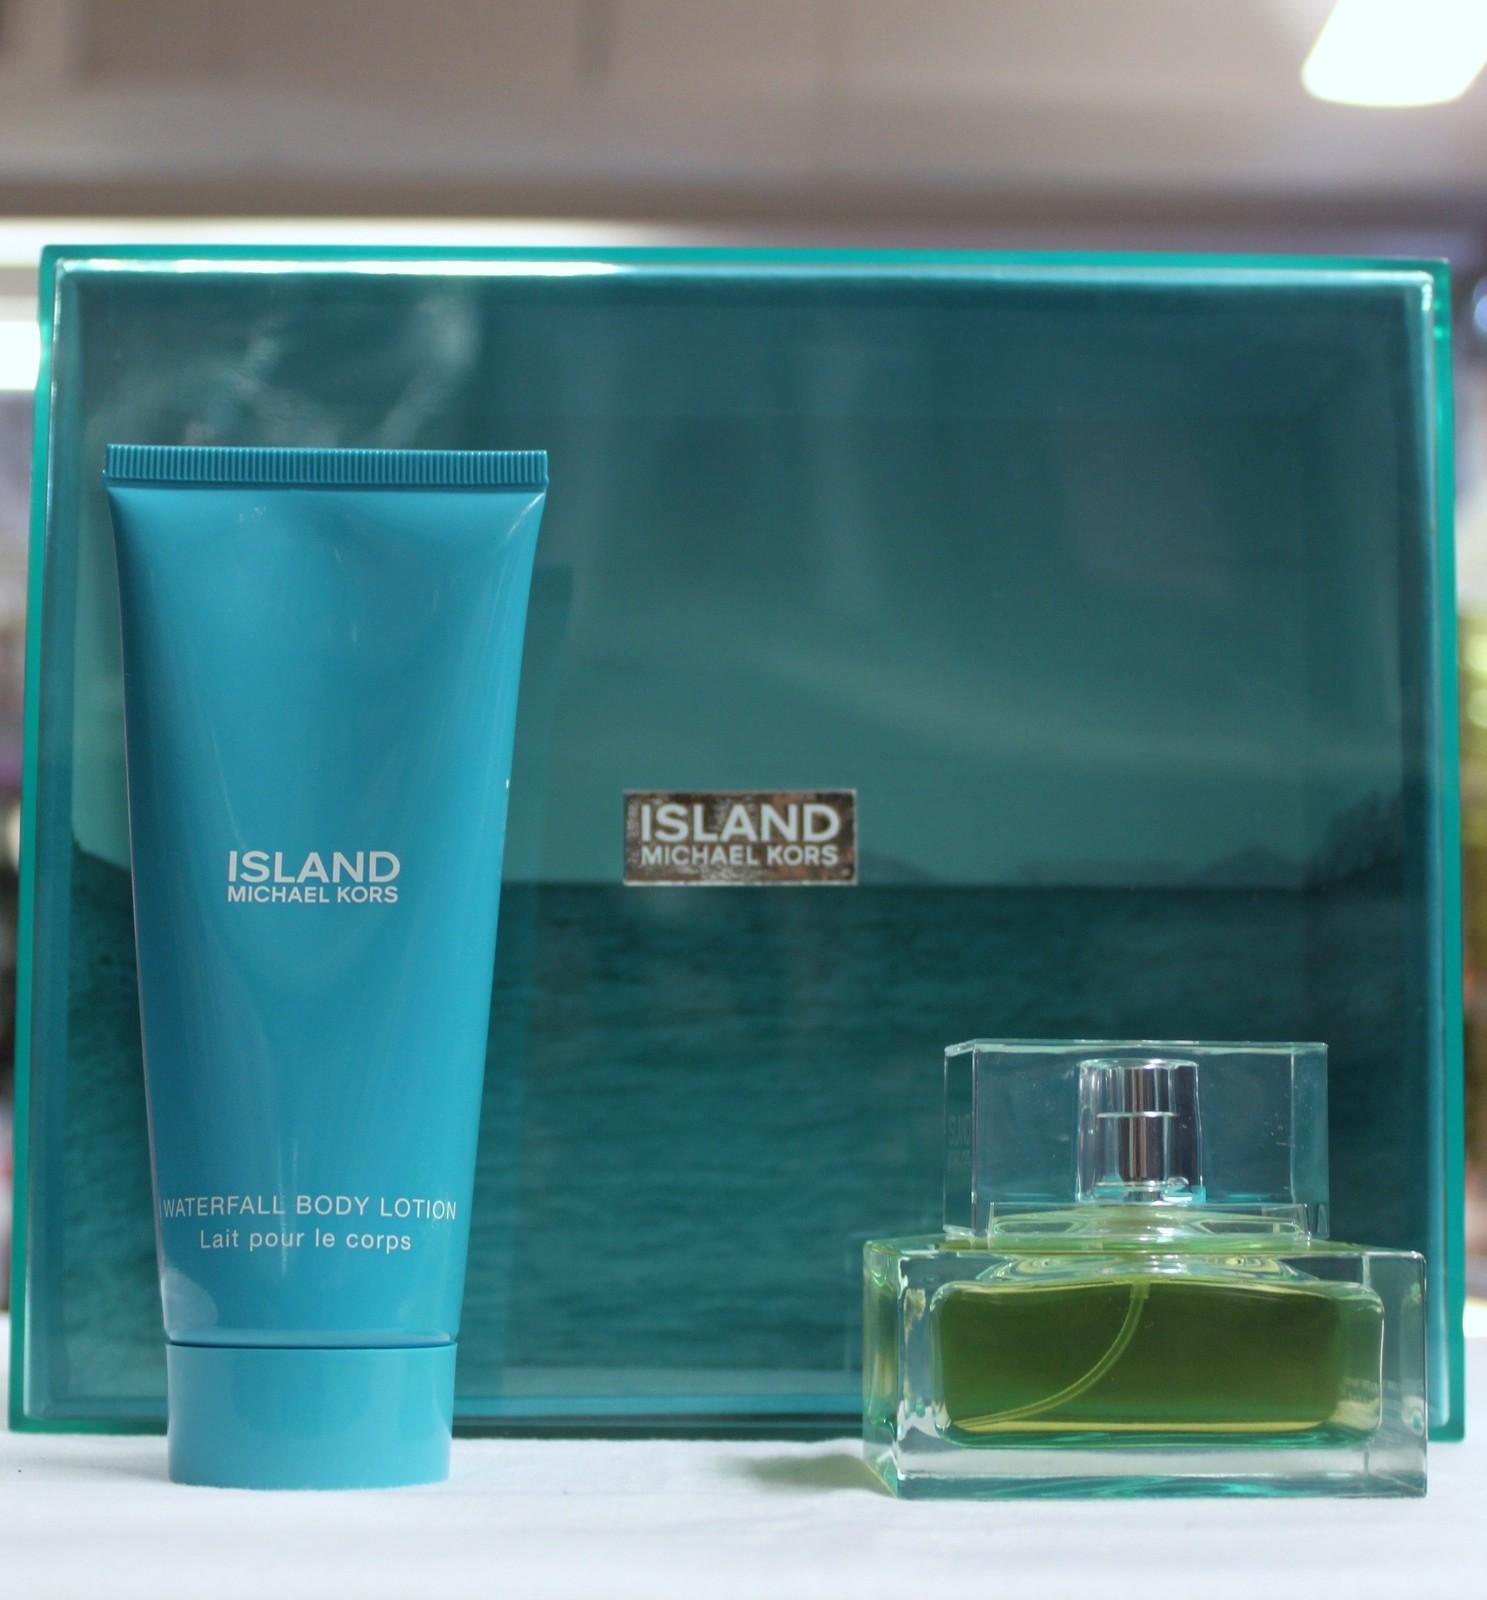 Island by Michael Kors 2PCs Women Set, 1.7 oz + 3.4 Body Lotion, Hard to find